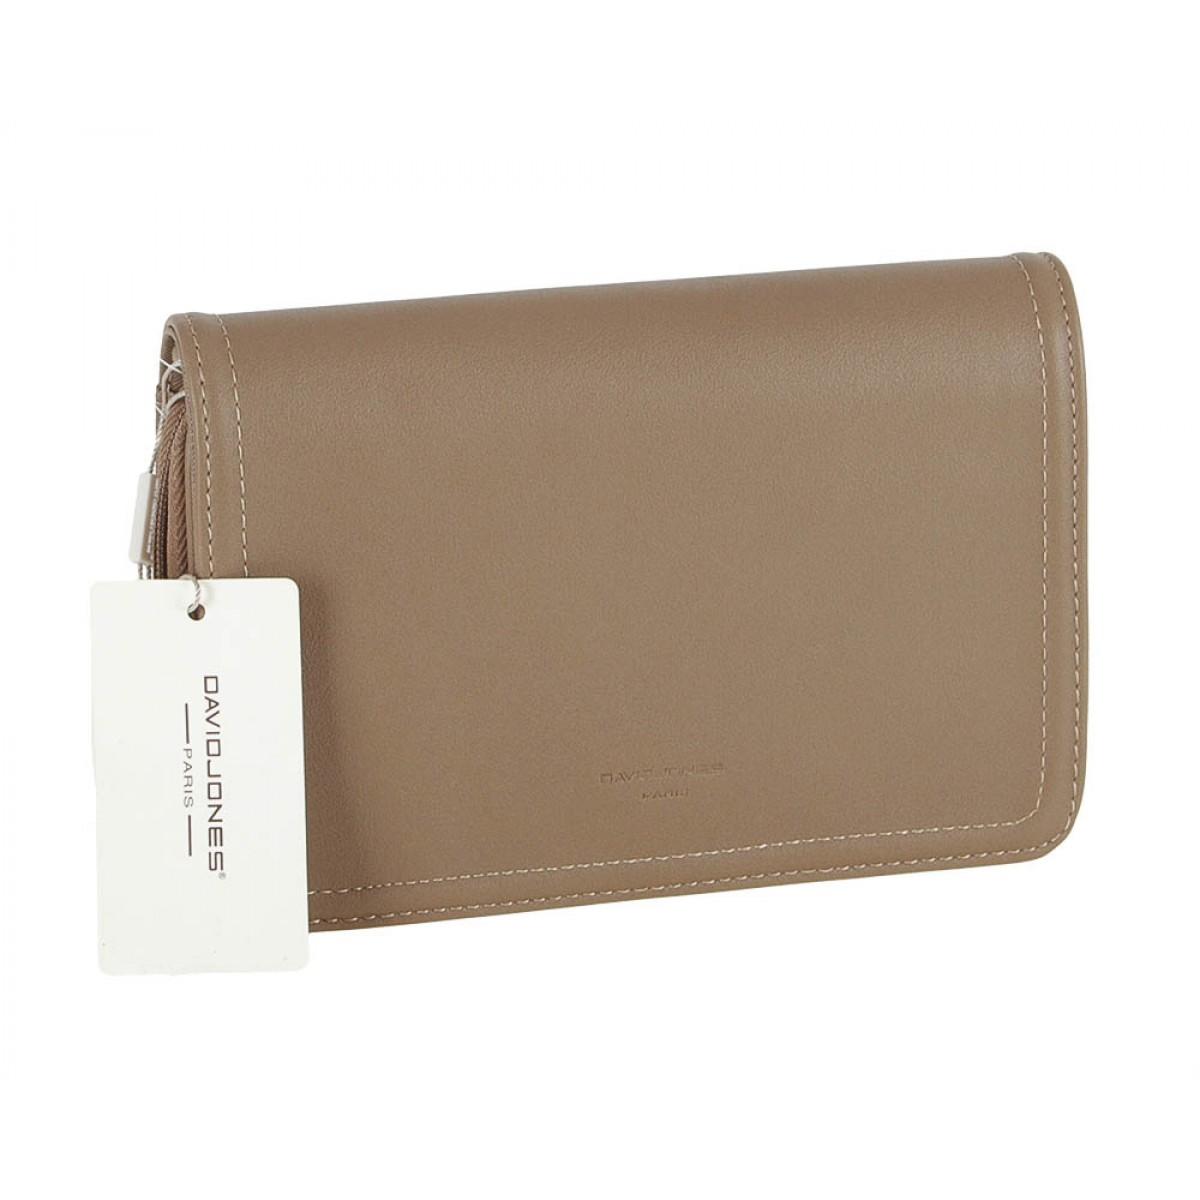 Жіноча сумка David Jones 5805-1 D.CAMEL